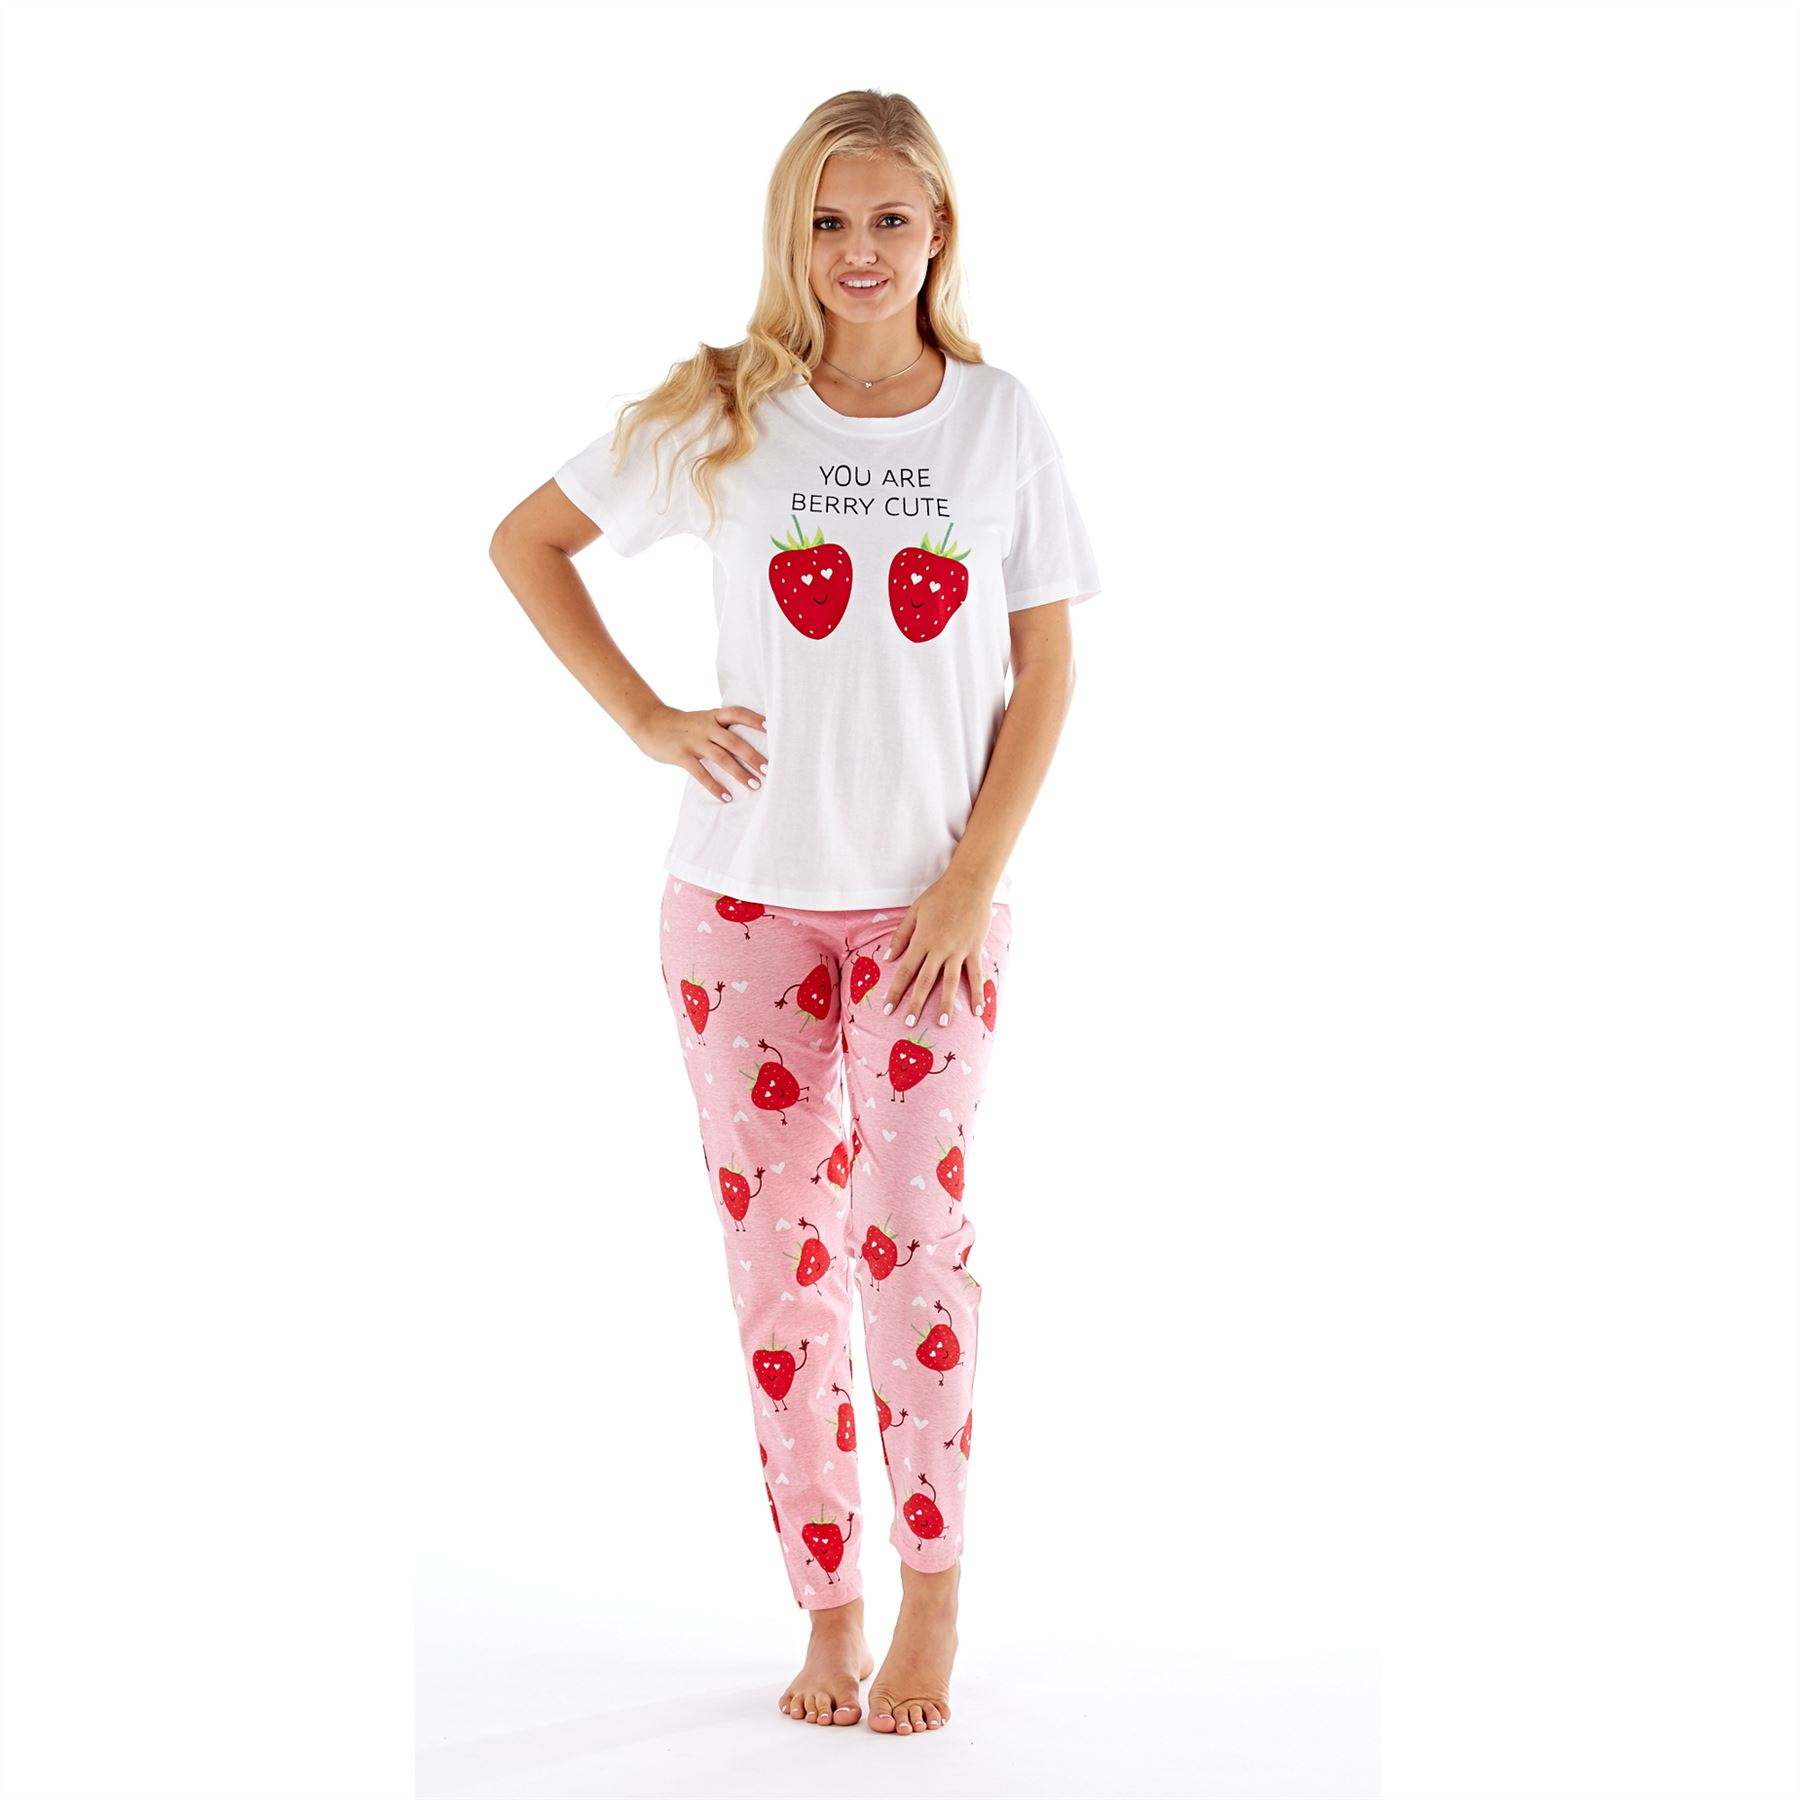 Womens-Ladies-Cotton-Pyjamas-Pyjama-PJs-Summer-Nightwear-Set-Size-8-18-NEW thumbnail 32